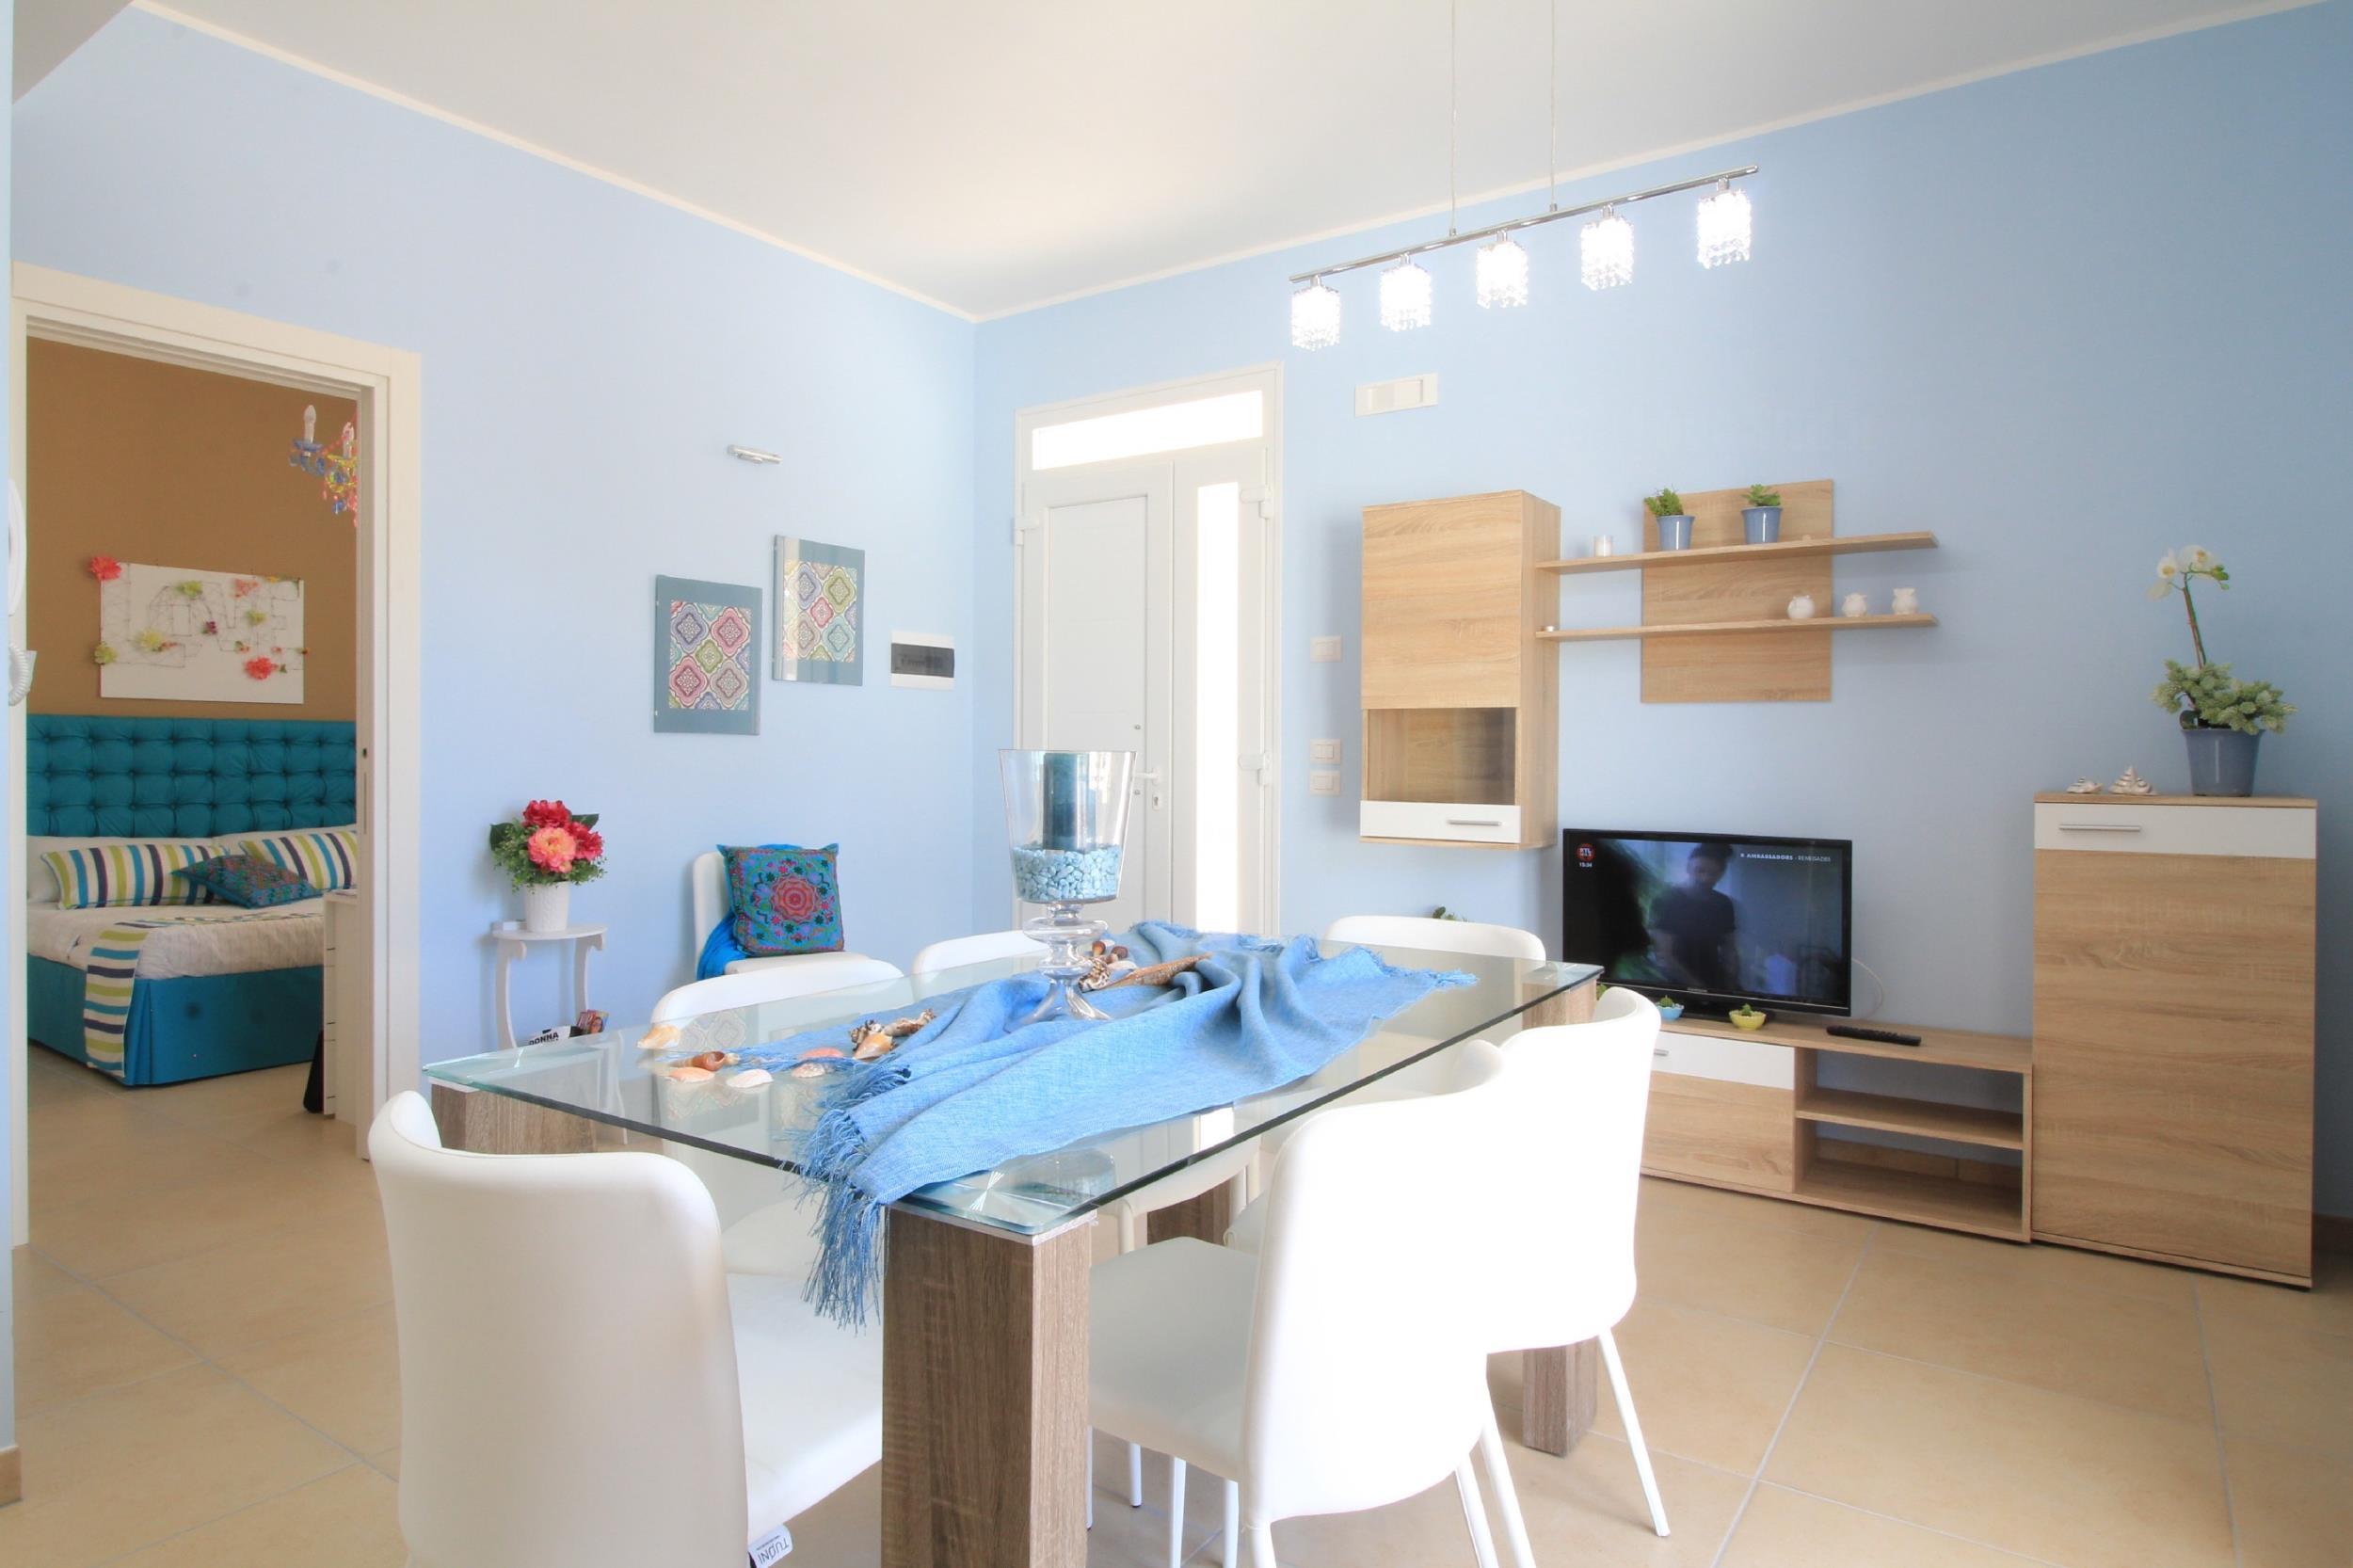 Apartment Elcisia luxe beach house photo 23457098